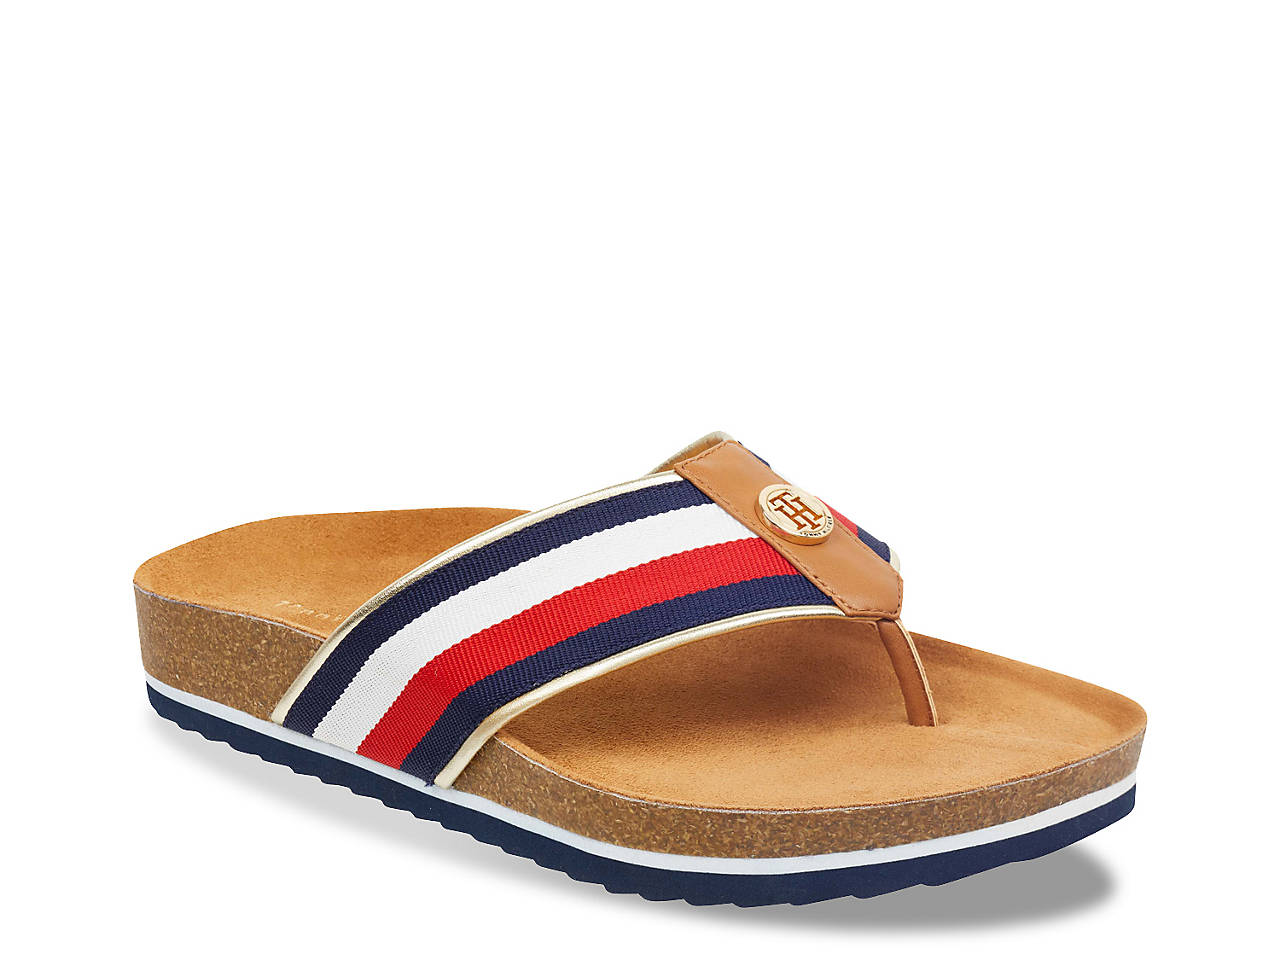 cab2d8489809 Tommy Hilfiger Gevina Flat Sandal Women s Shoes